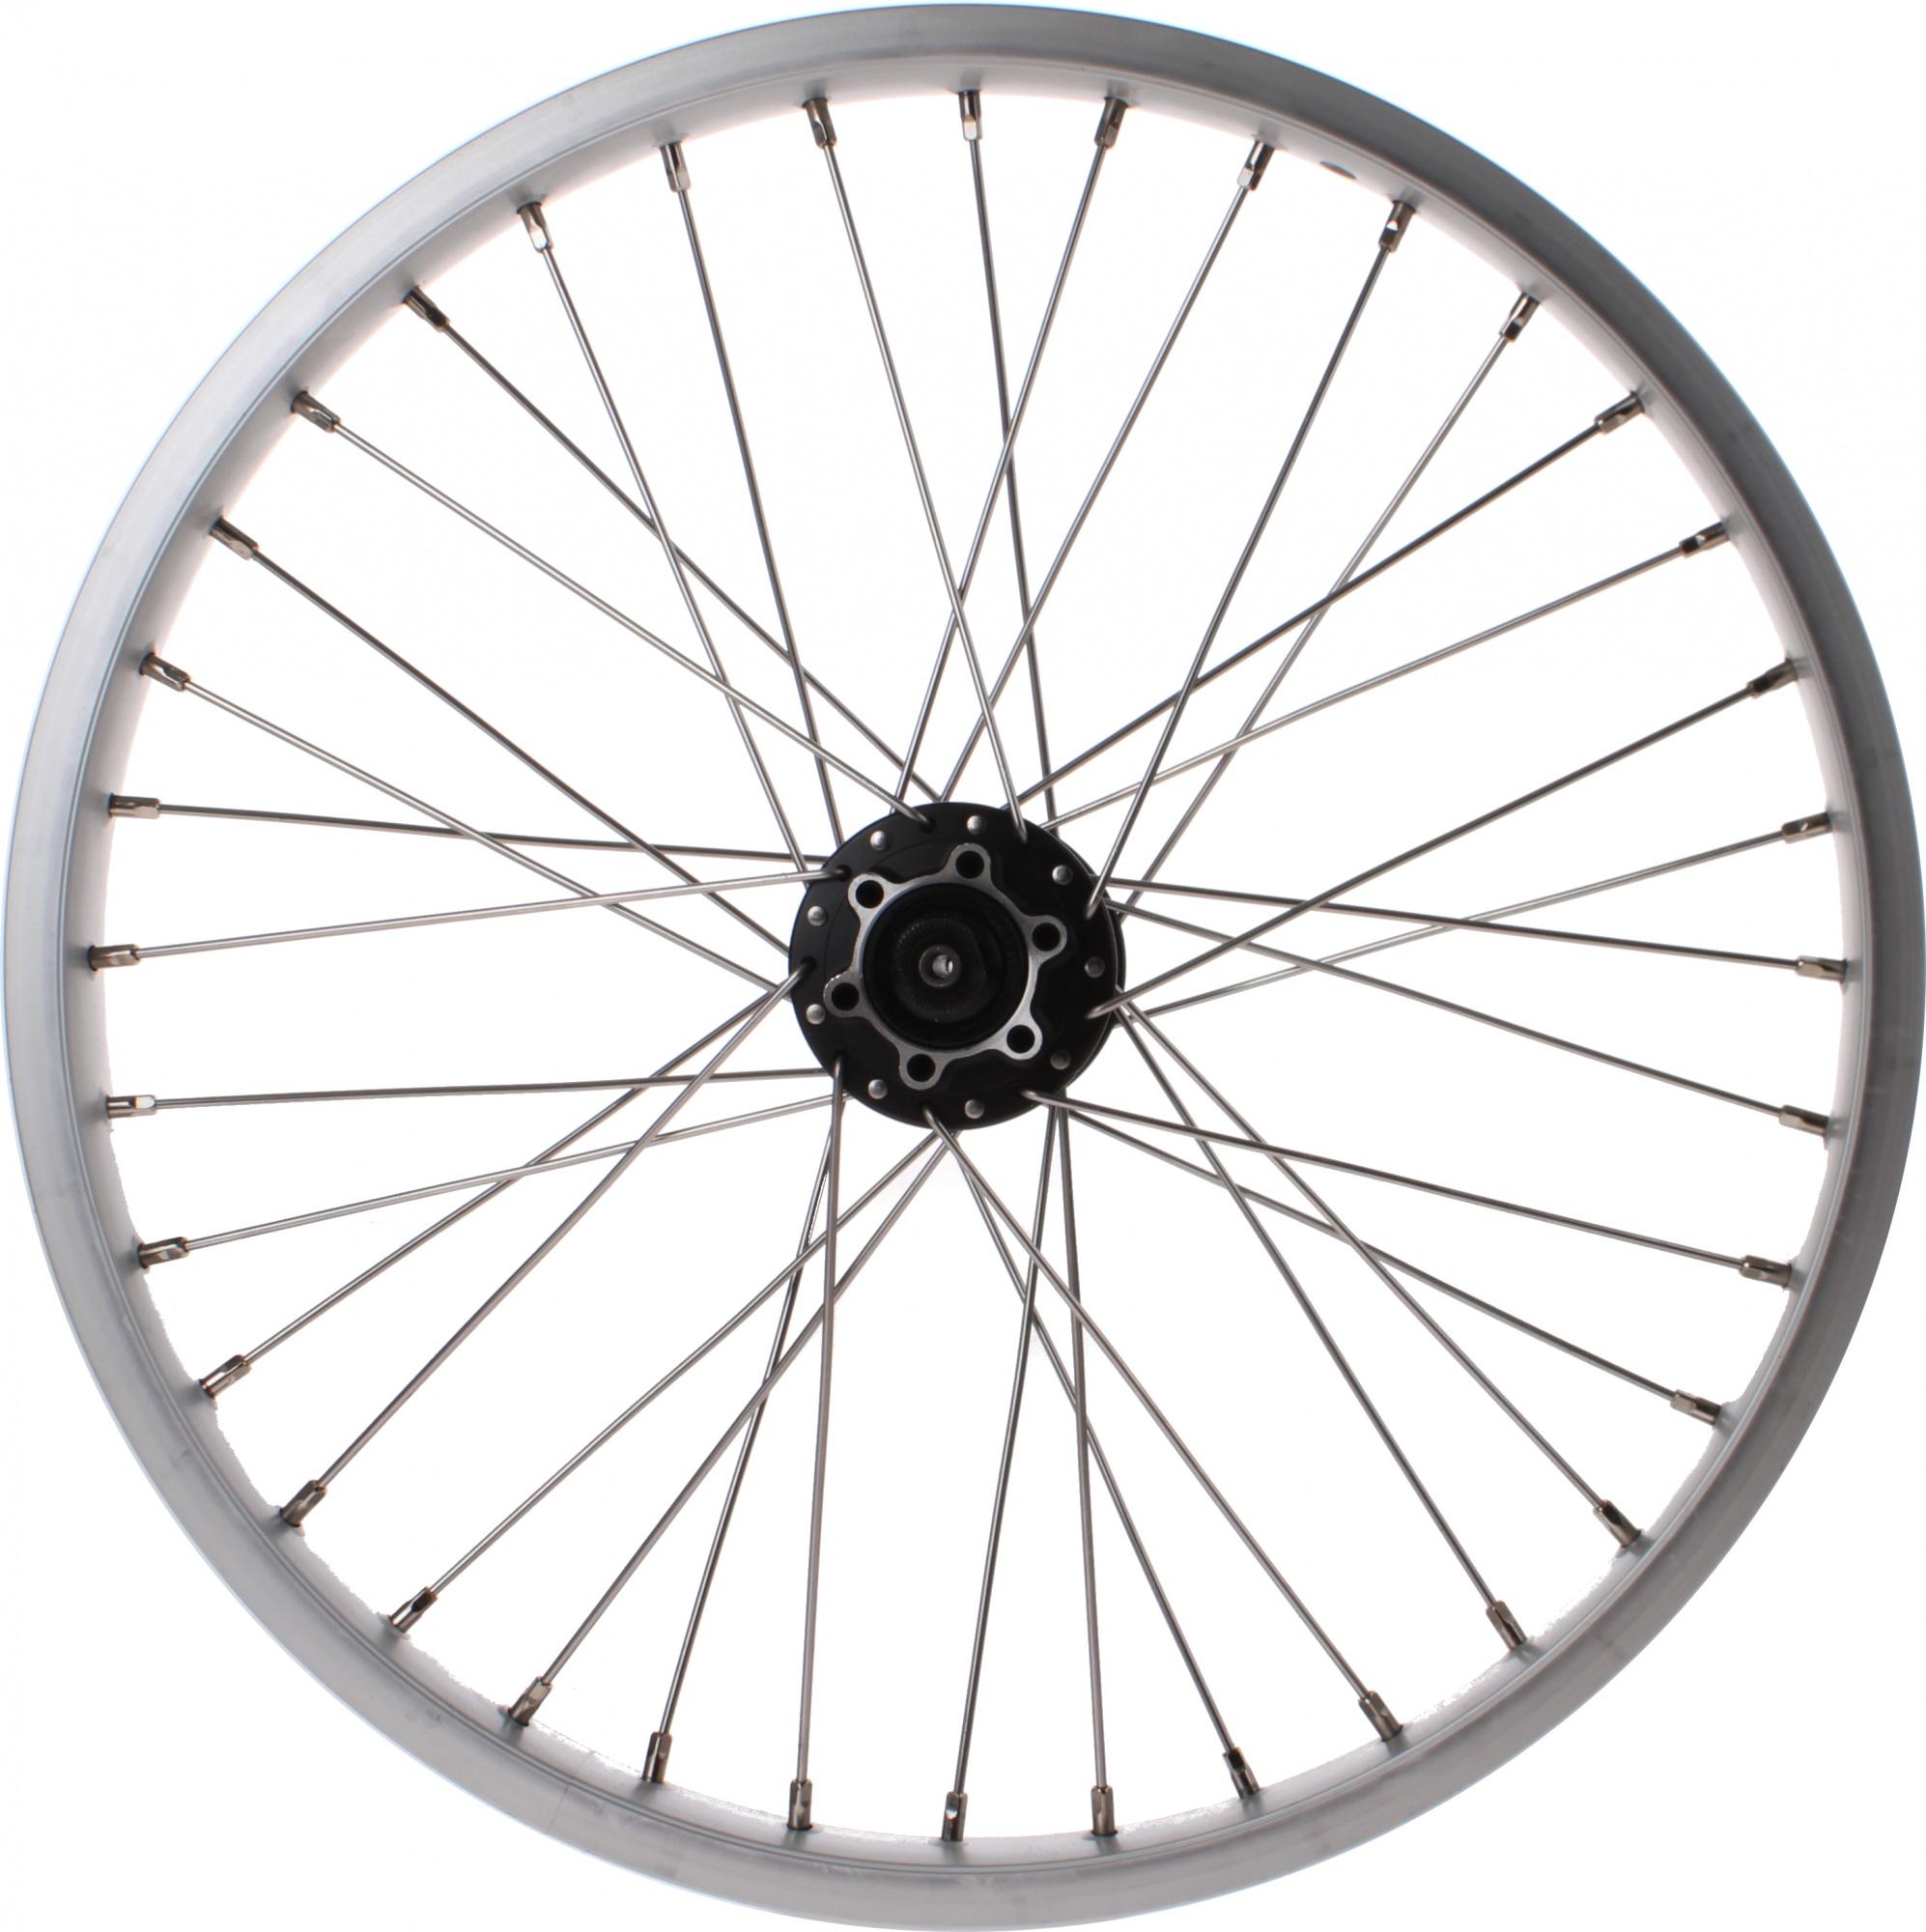 Bike Bicycle MX Brake Front Alloy Black BRAKE CRUISER BIKE PART BRAND NEW